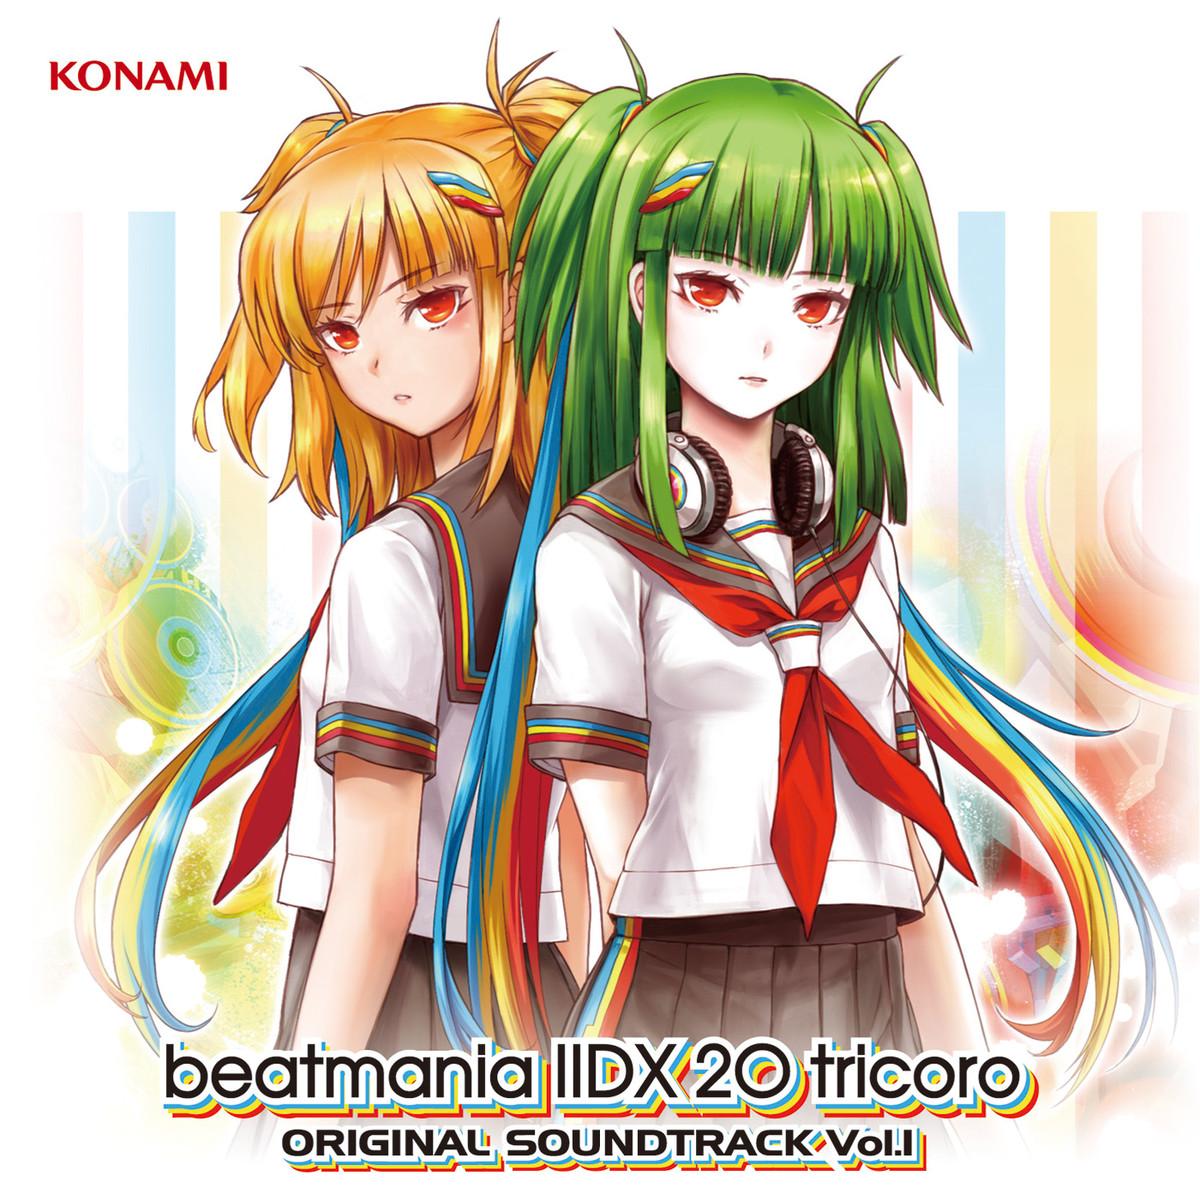 beatmania IIDX 20 tricoro ORIGINAL SOUNDTRAC..